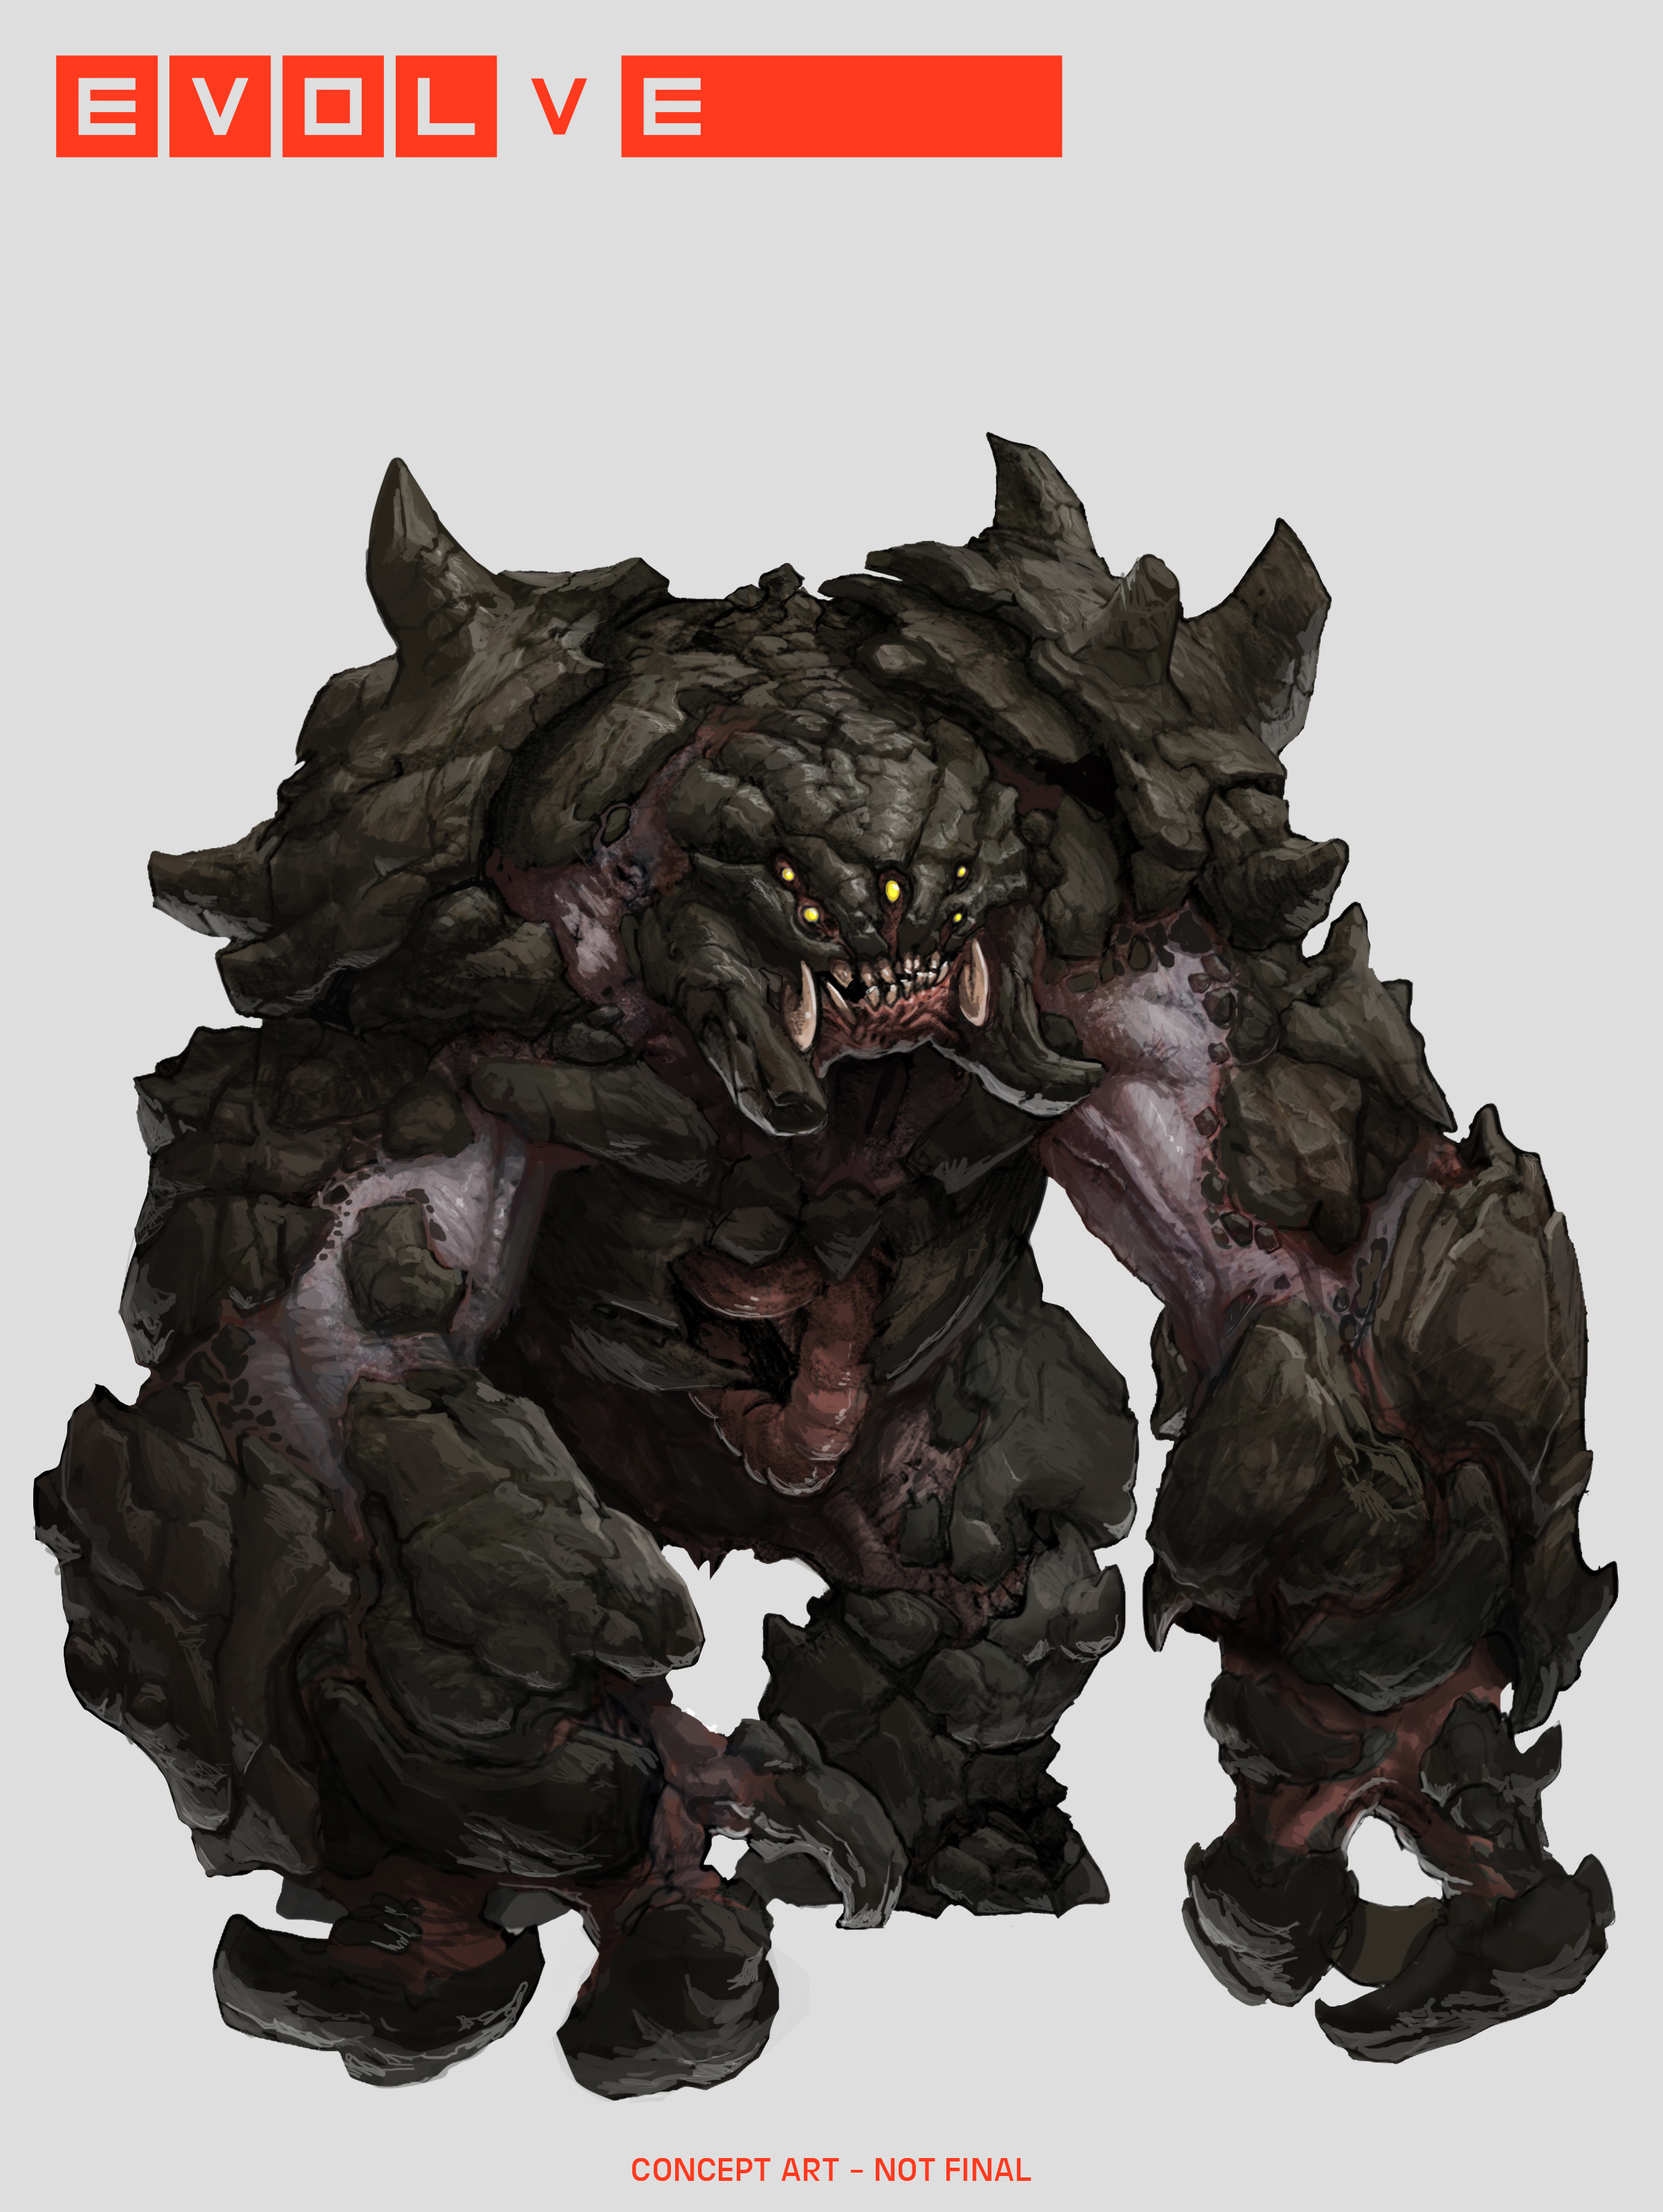 Evolve Béhémoth